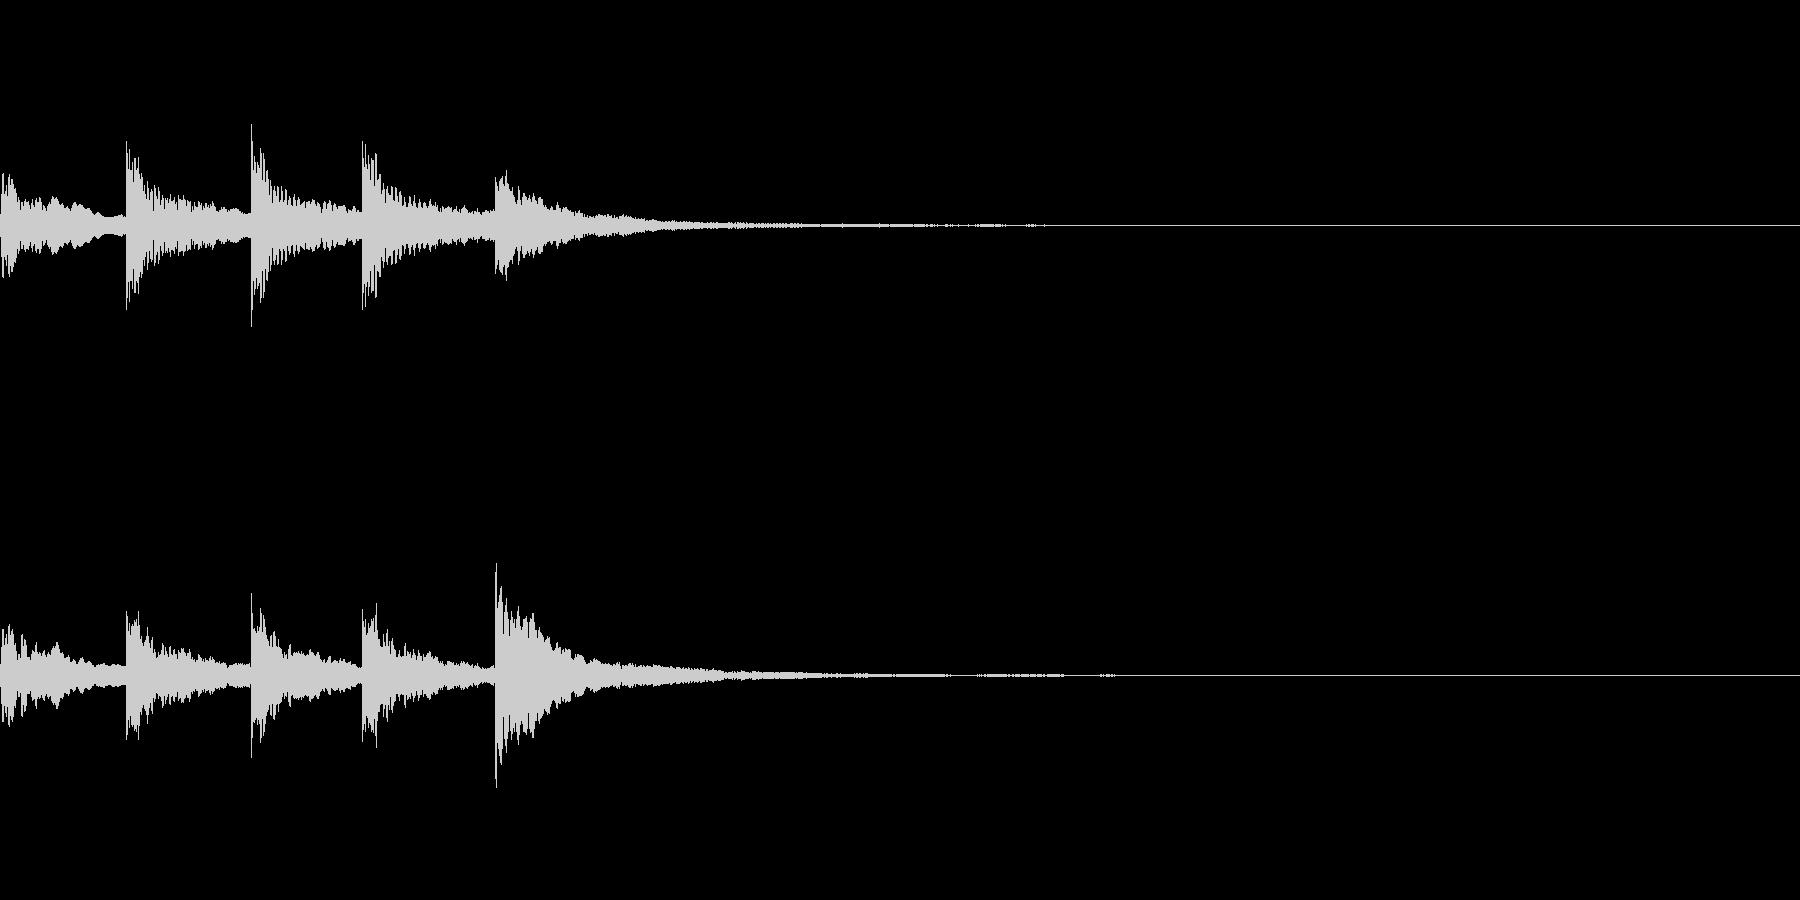 【SE 効果音】ティロティリロリンの未再生の波形